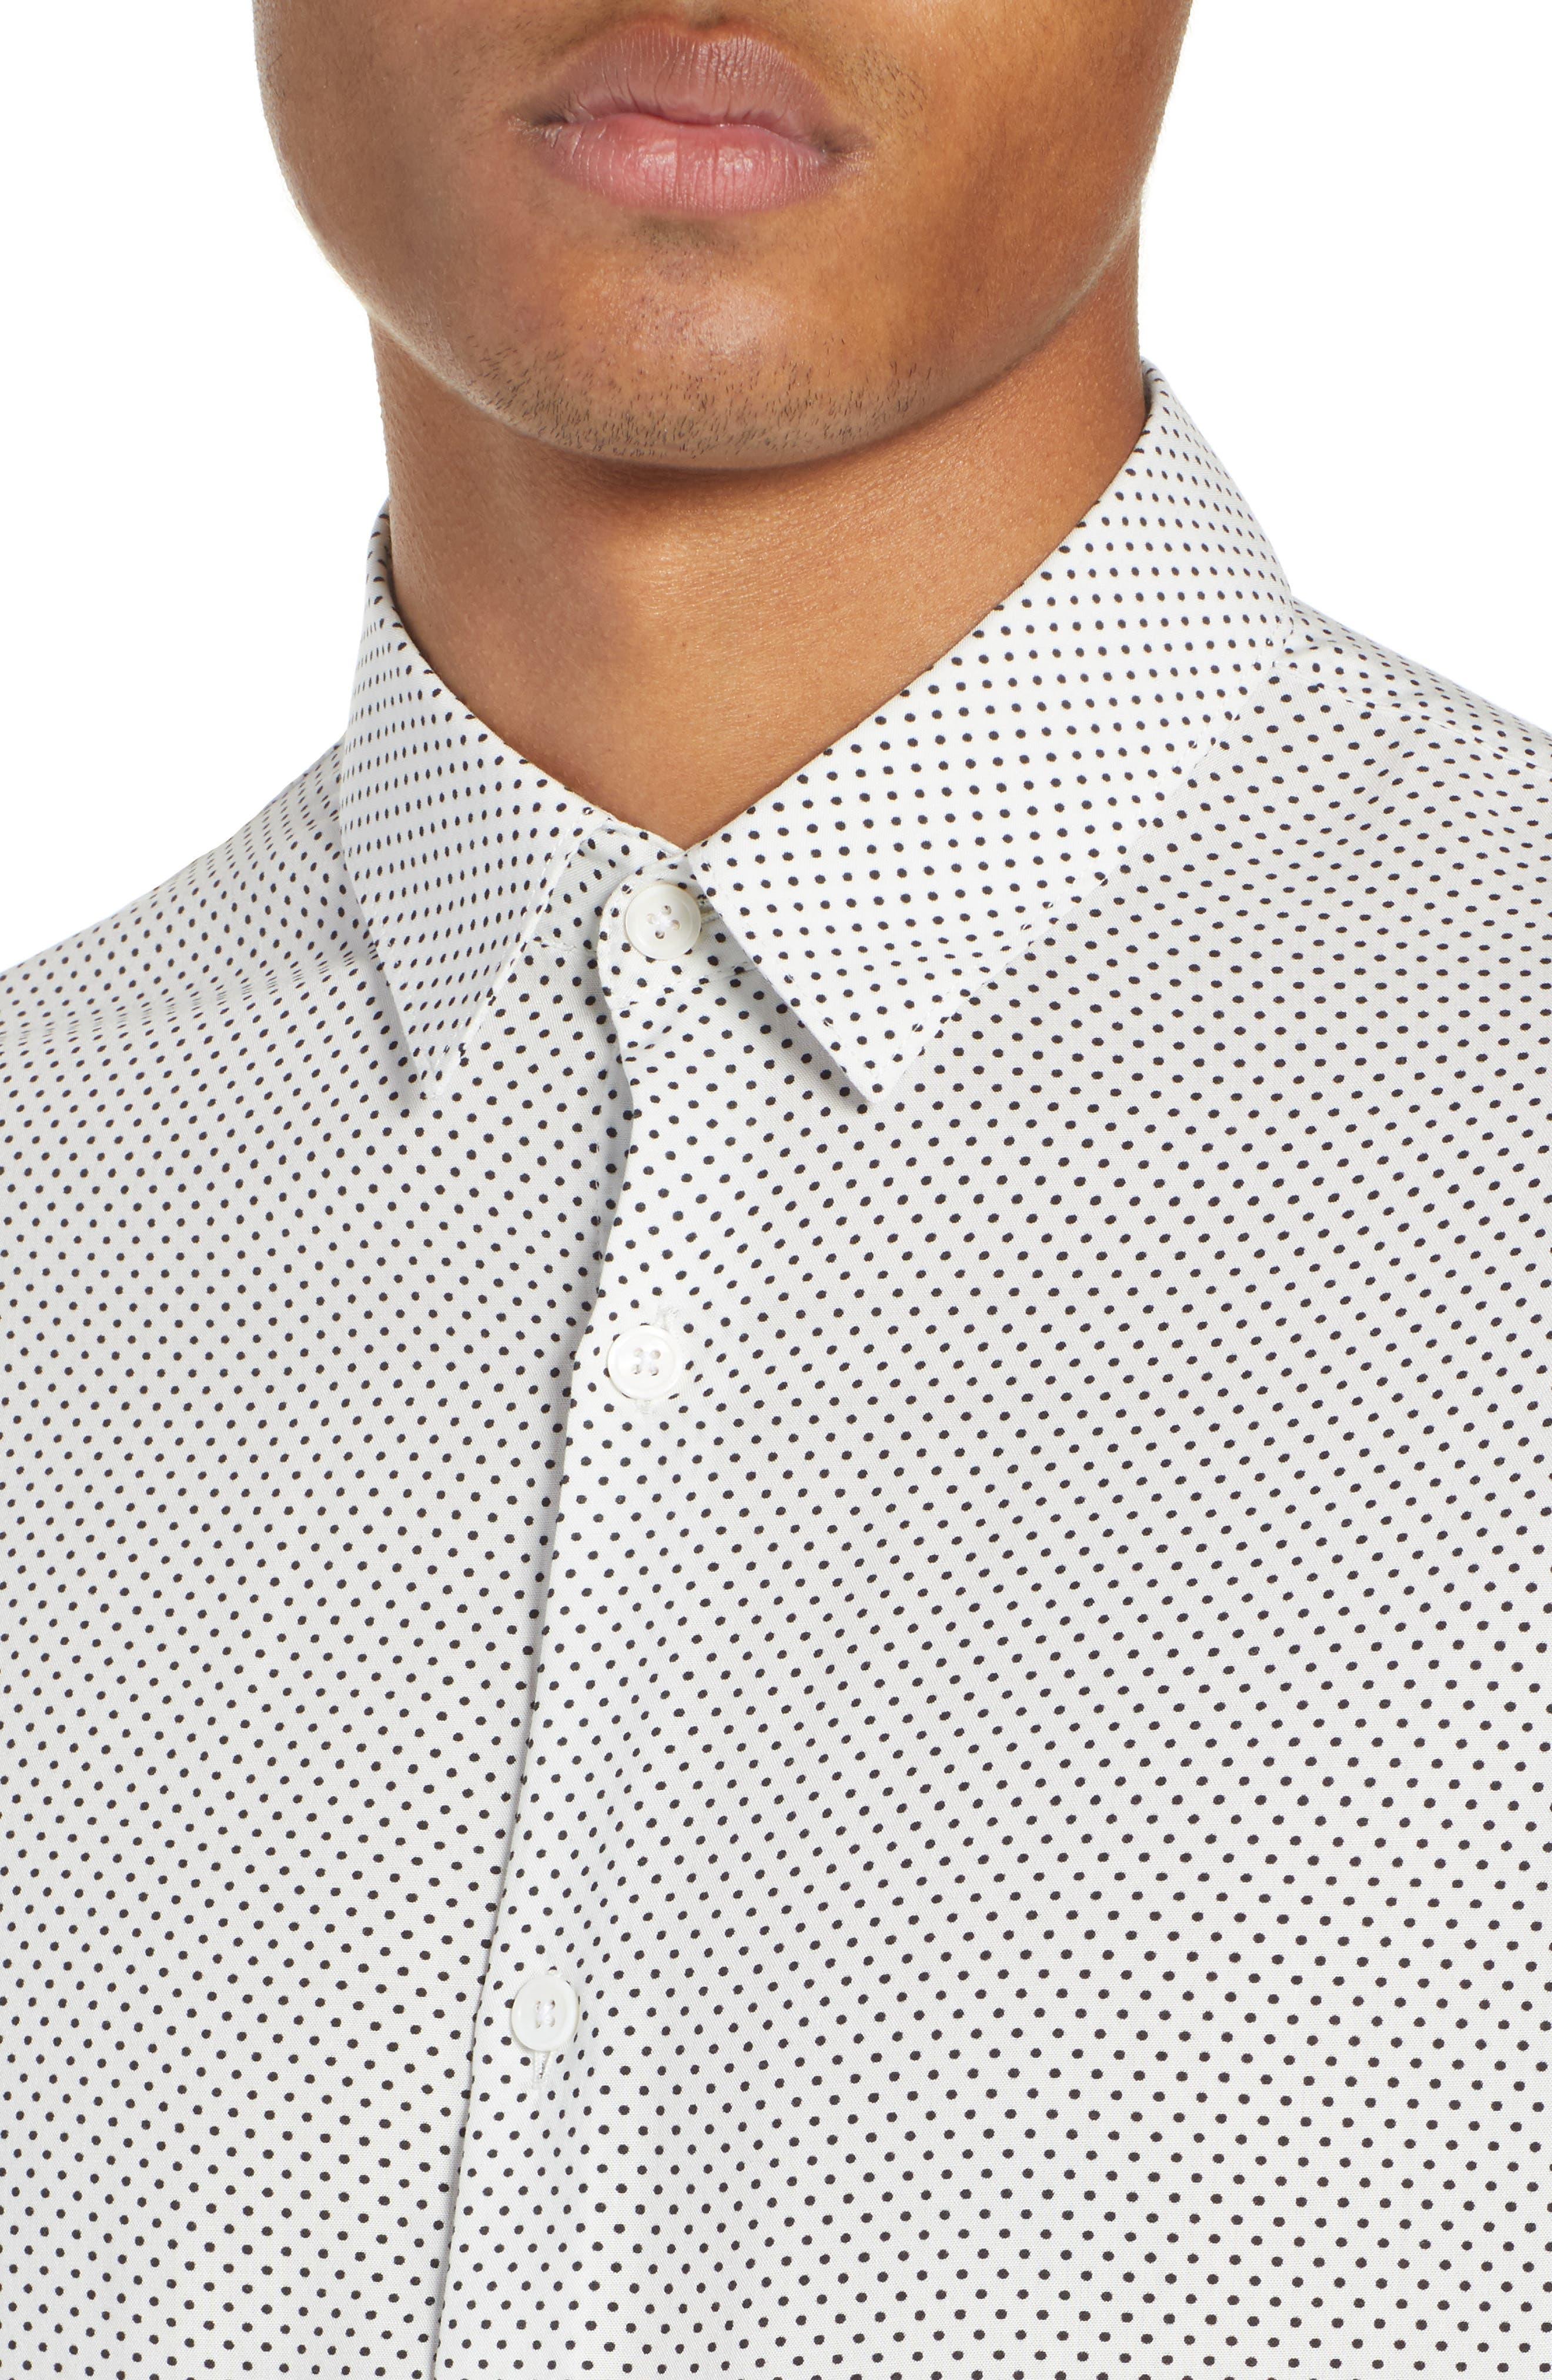 THE KOOPLES, Dot Print Sport Shirt, Alternate thumbnail 2, color, BEIGE-BLACK